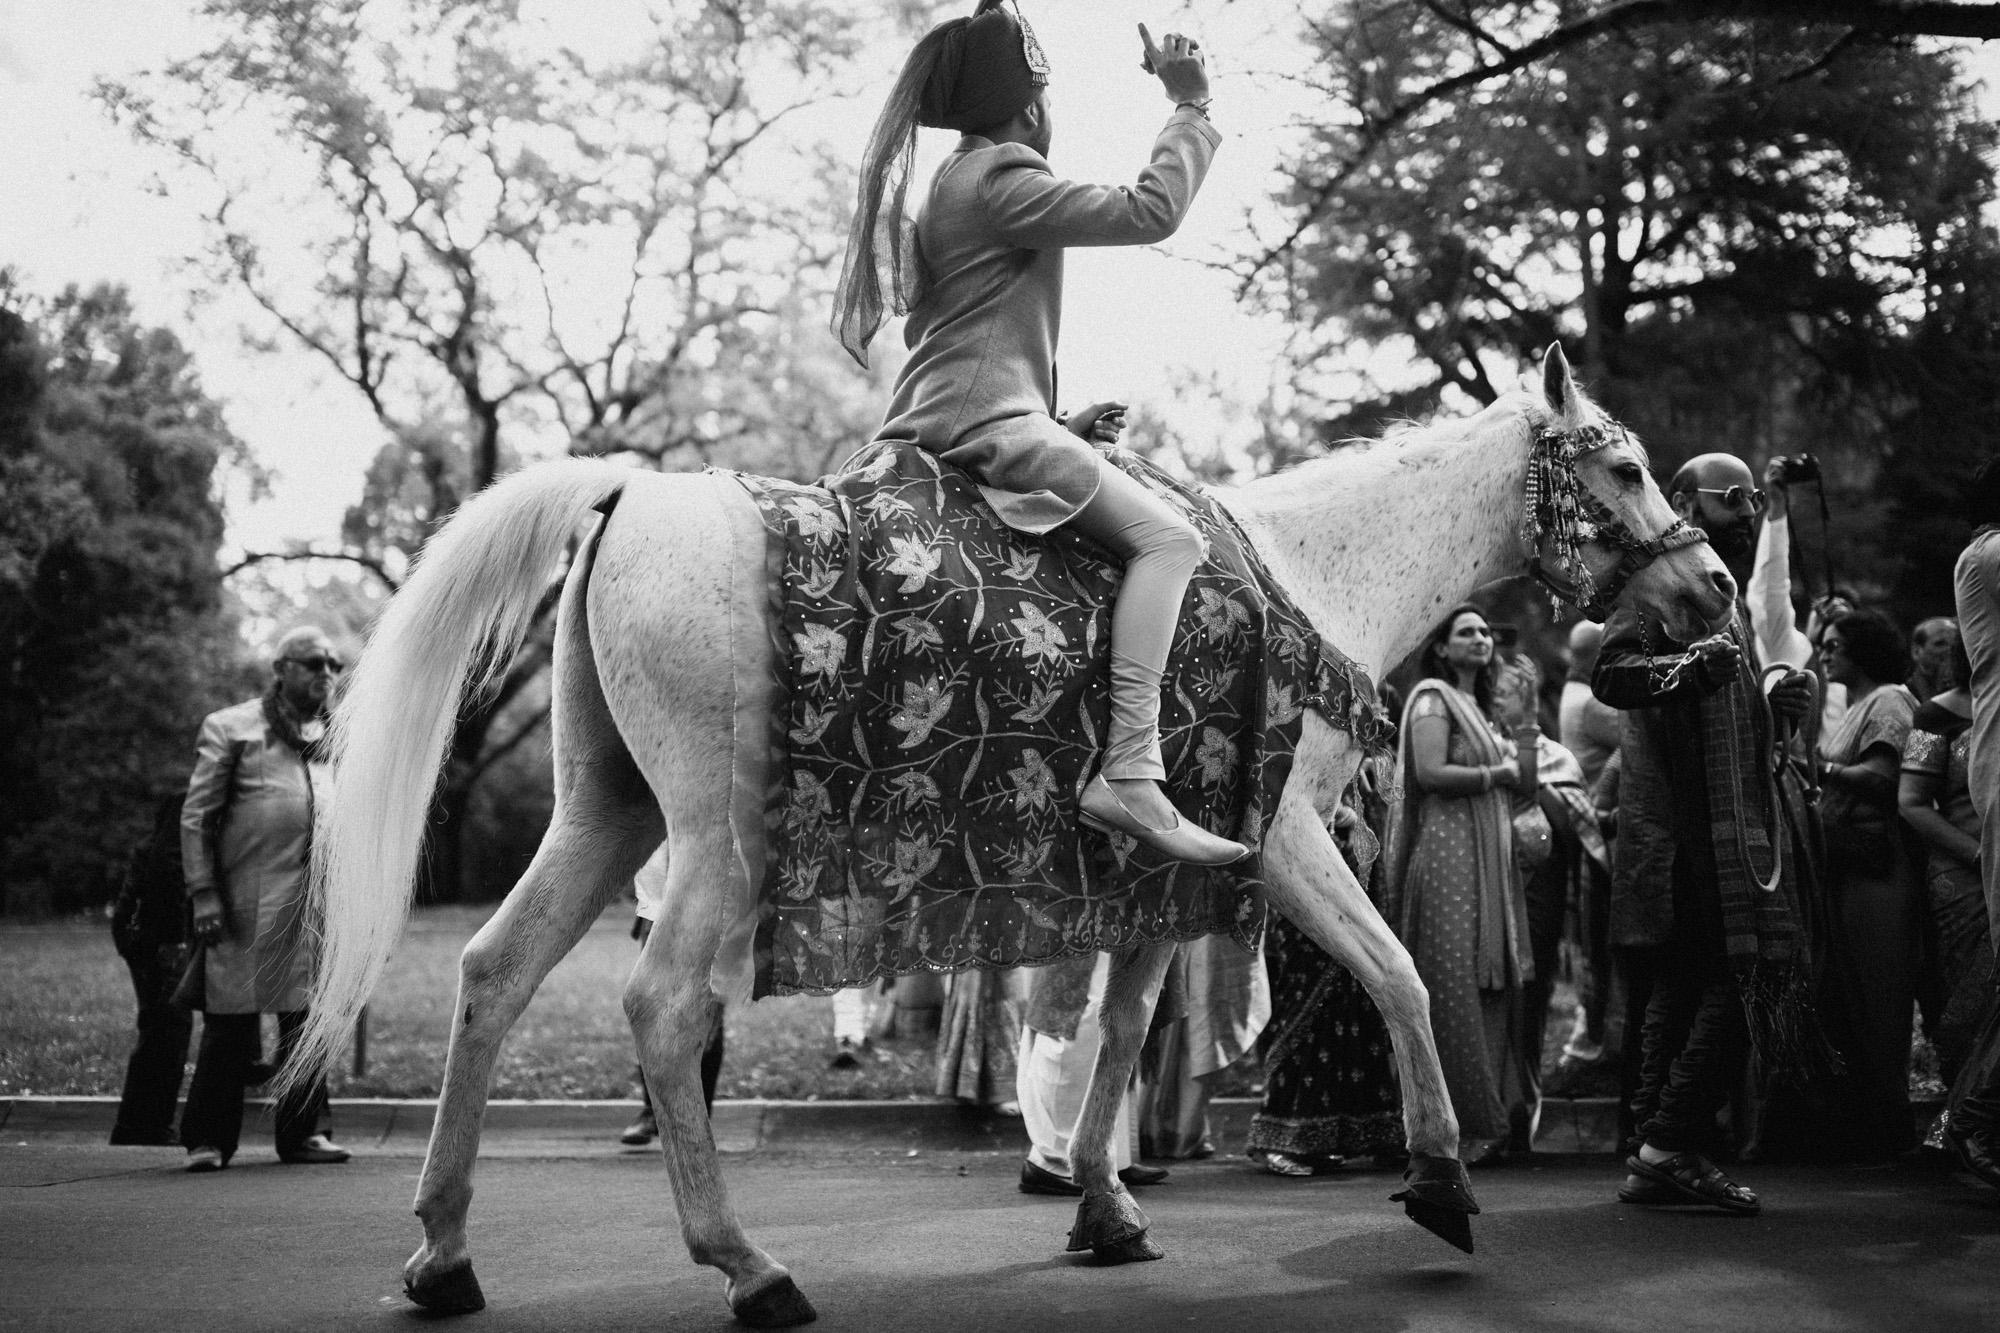 anu_maneesh_alec_vanderboom_Indian_wedding_photography-0072.jpg